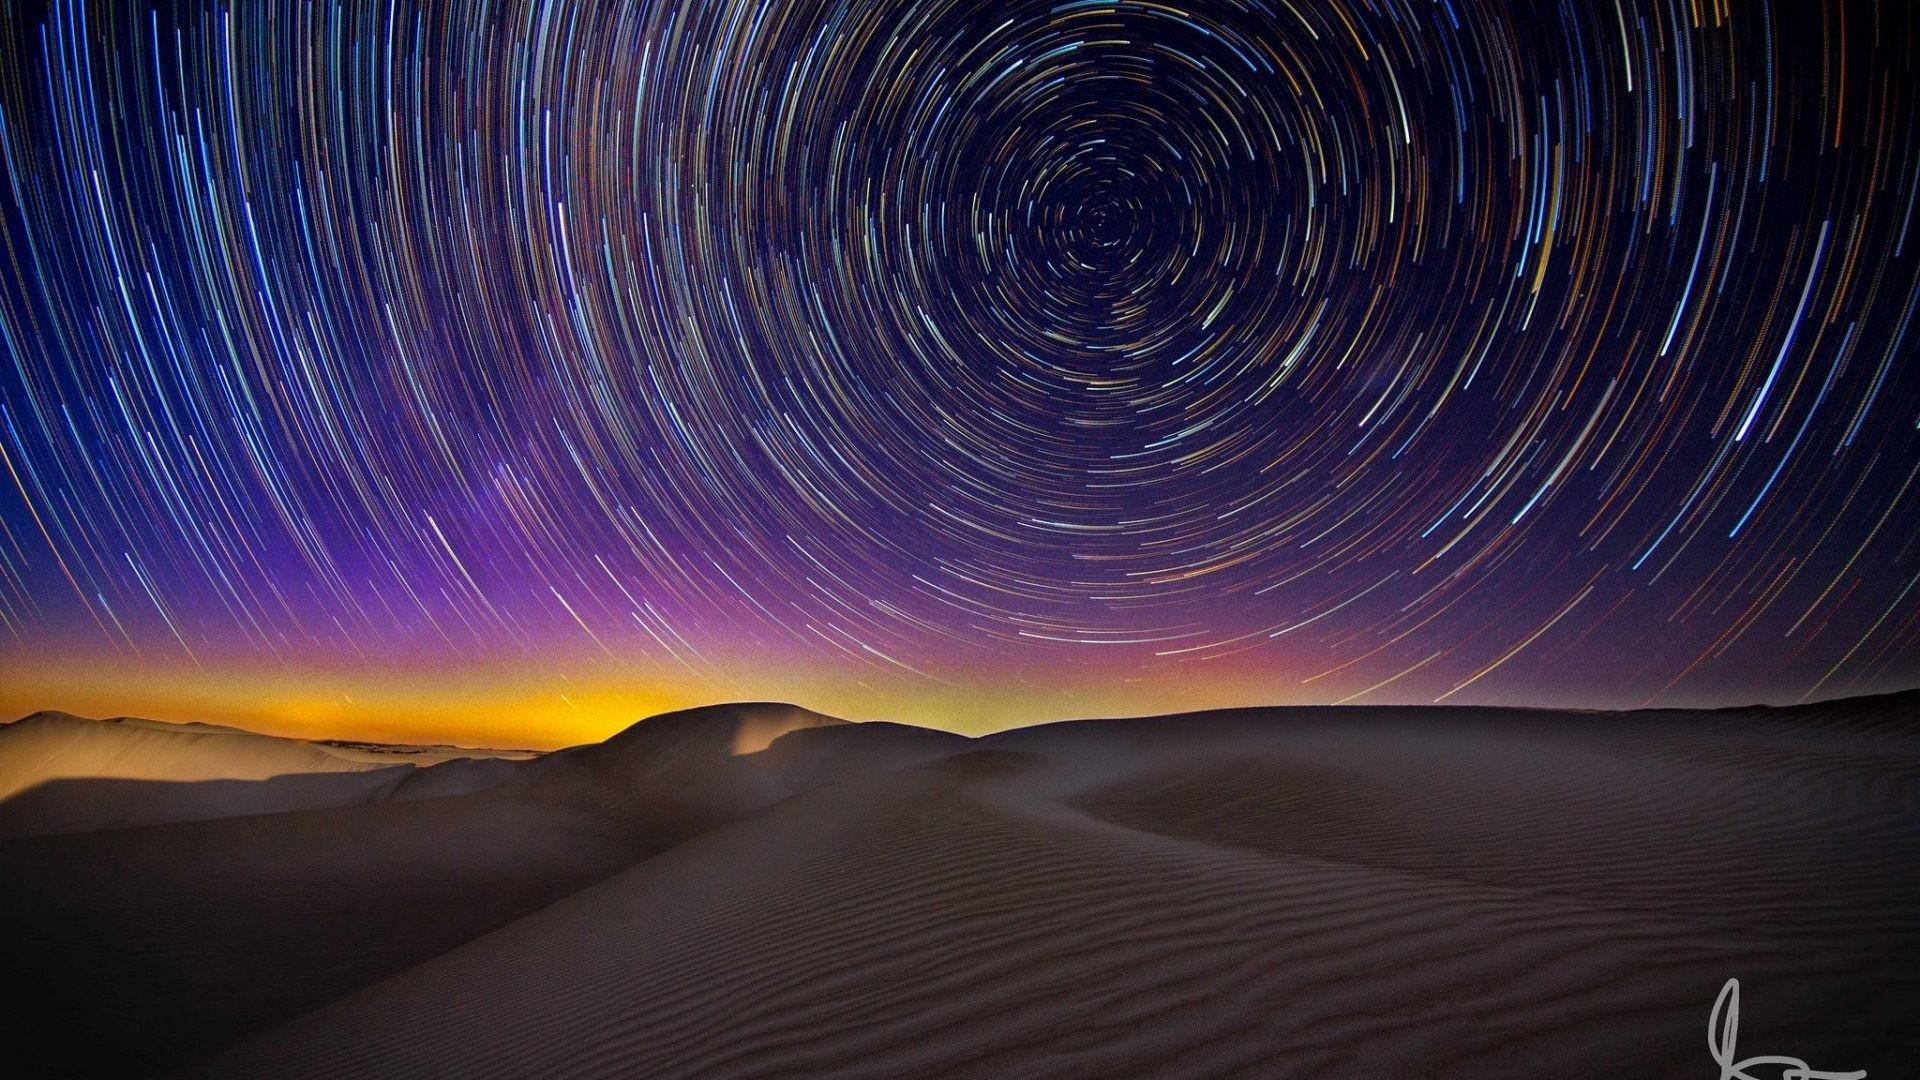 Stars Tag – Milky Night Stars Space Galaxy Sky Rock Desktop Image Nature  for HD 16